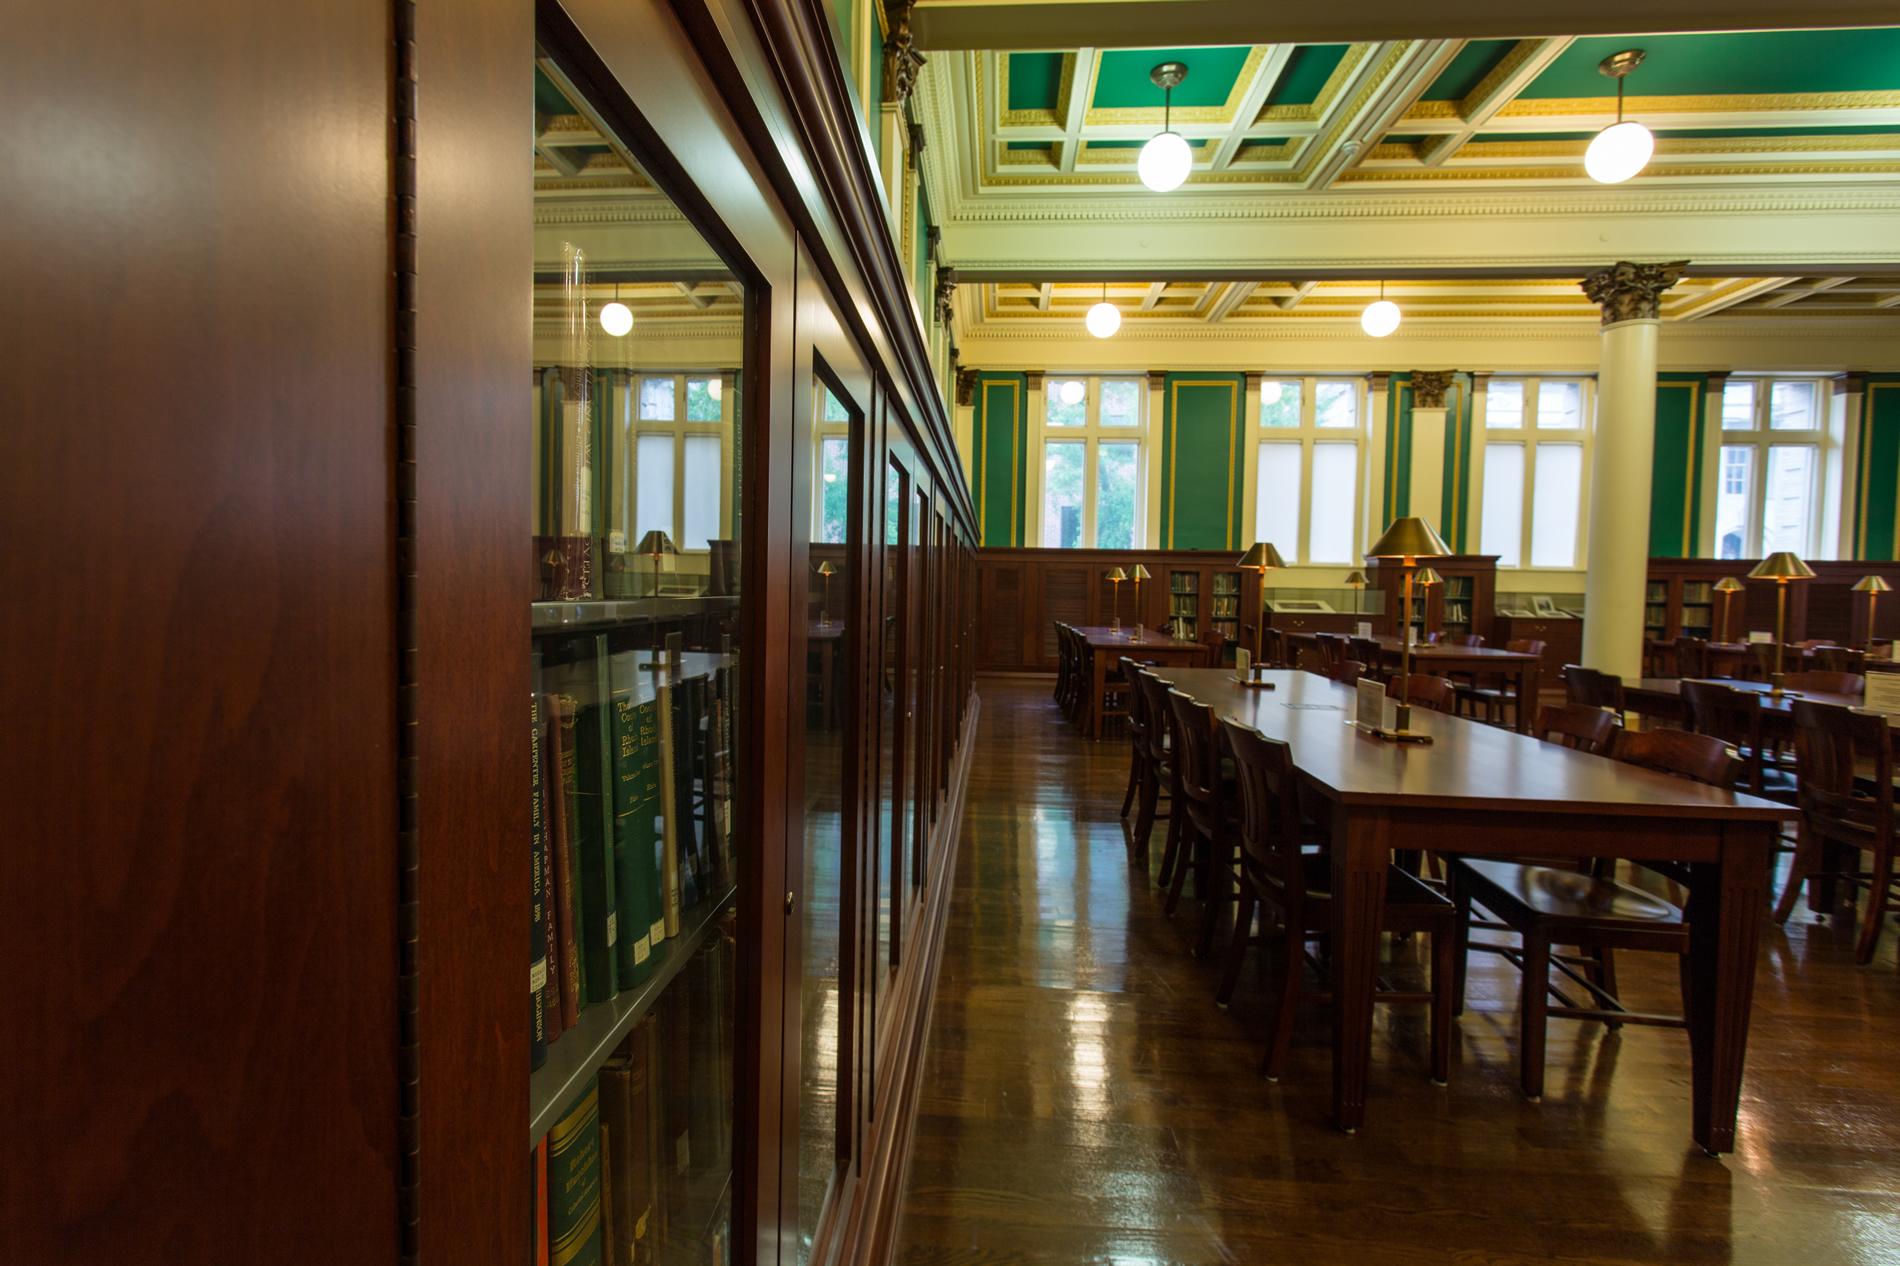 Prov Library 3